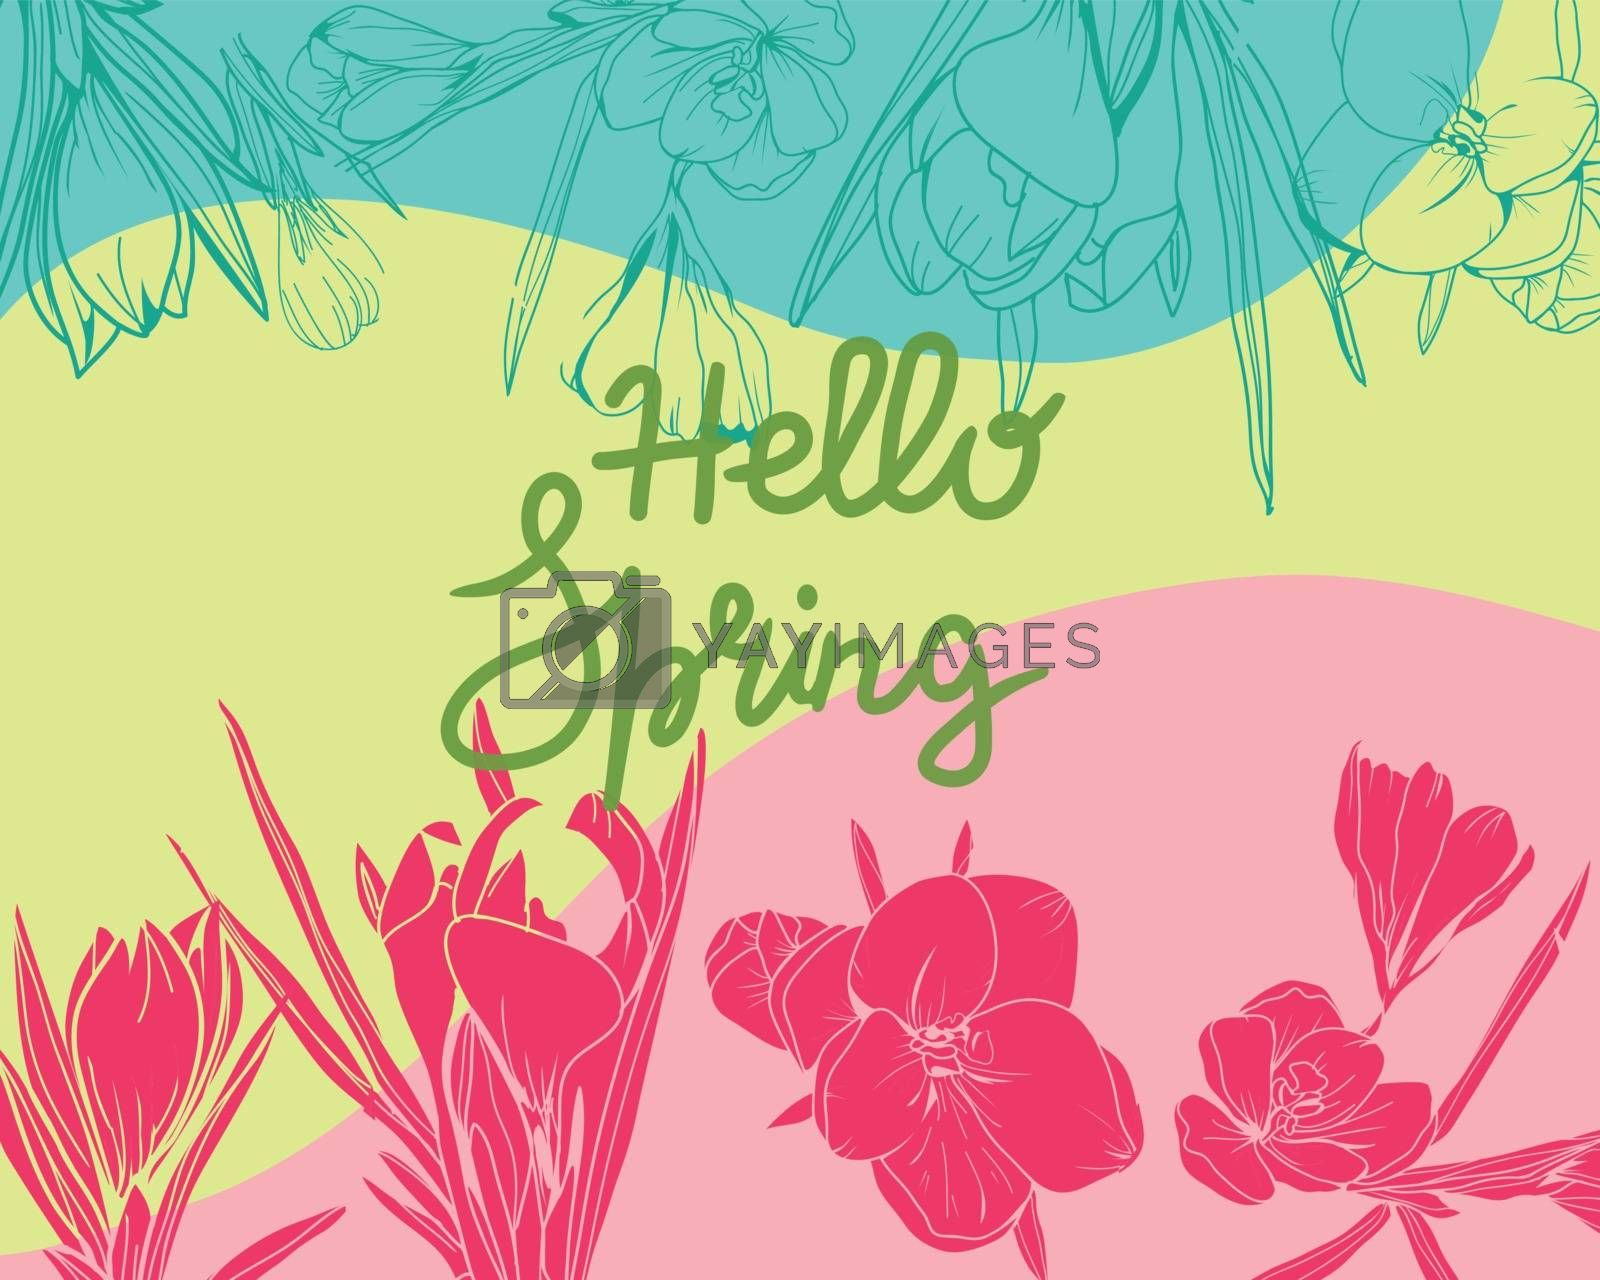 Hand-drawn crocus floral elements spring background. Hello Spring lettering. Hello spring vector concept design for banner, illustration, card, background.